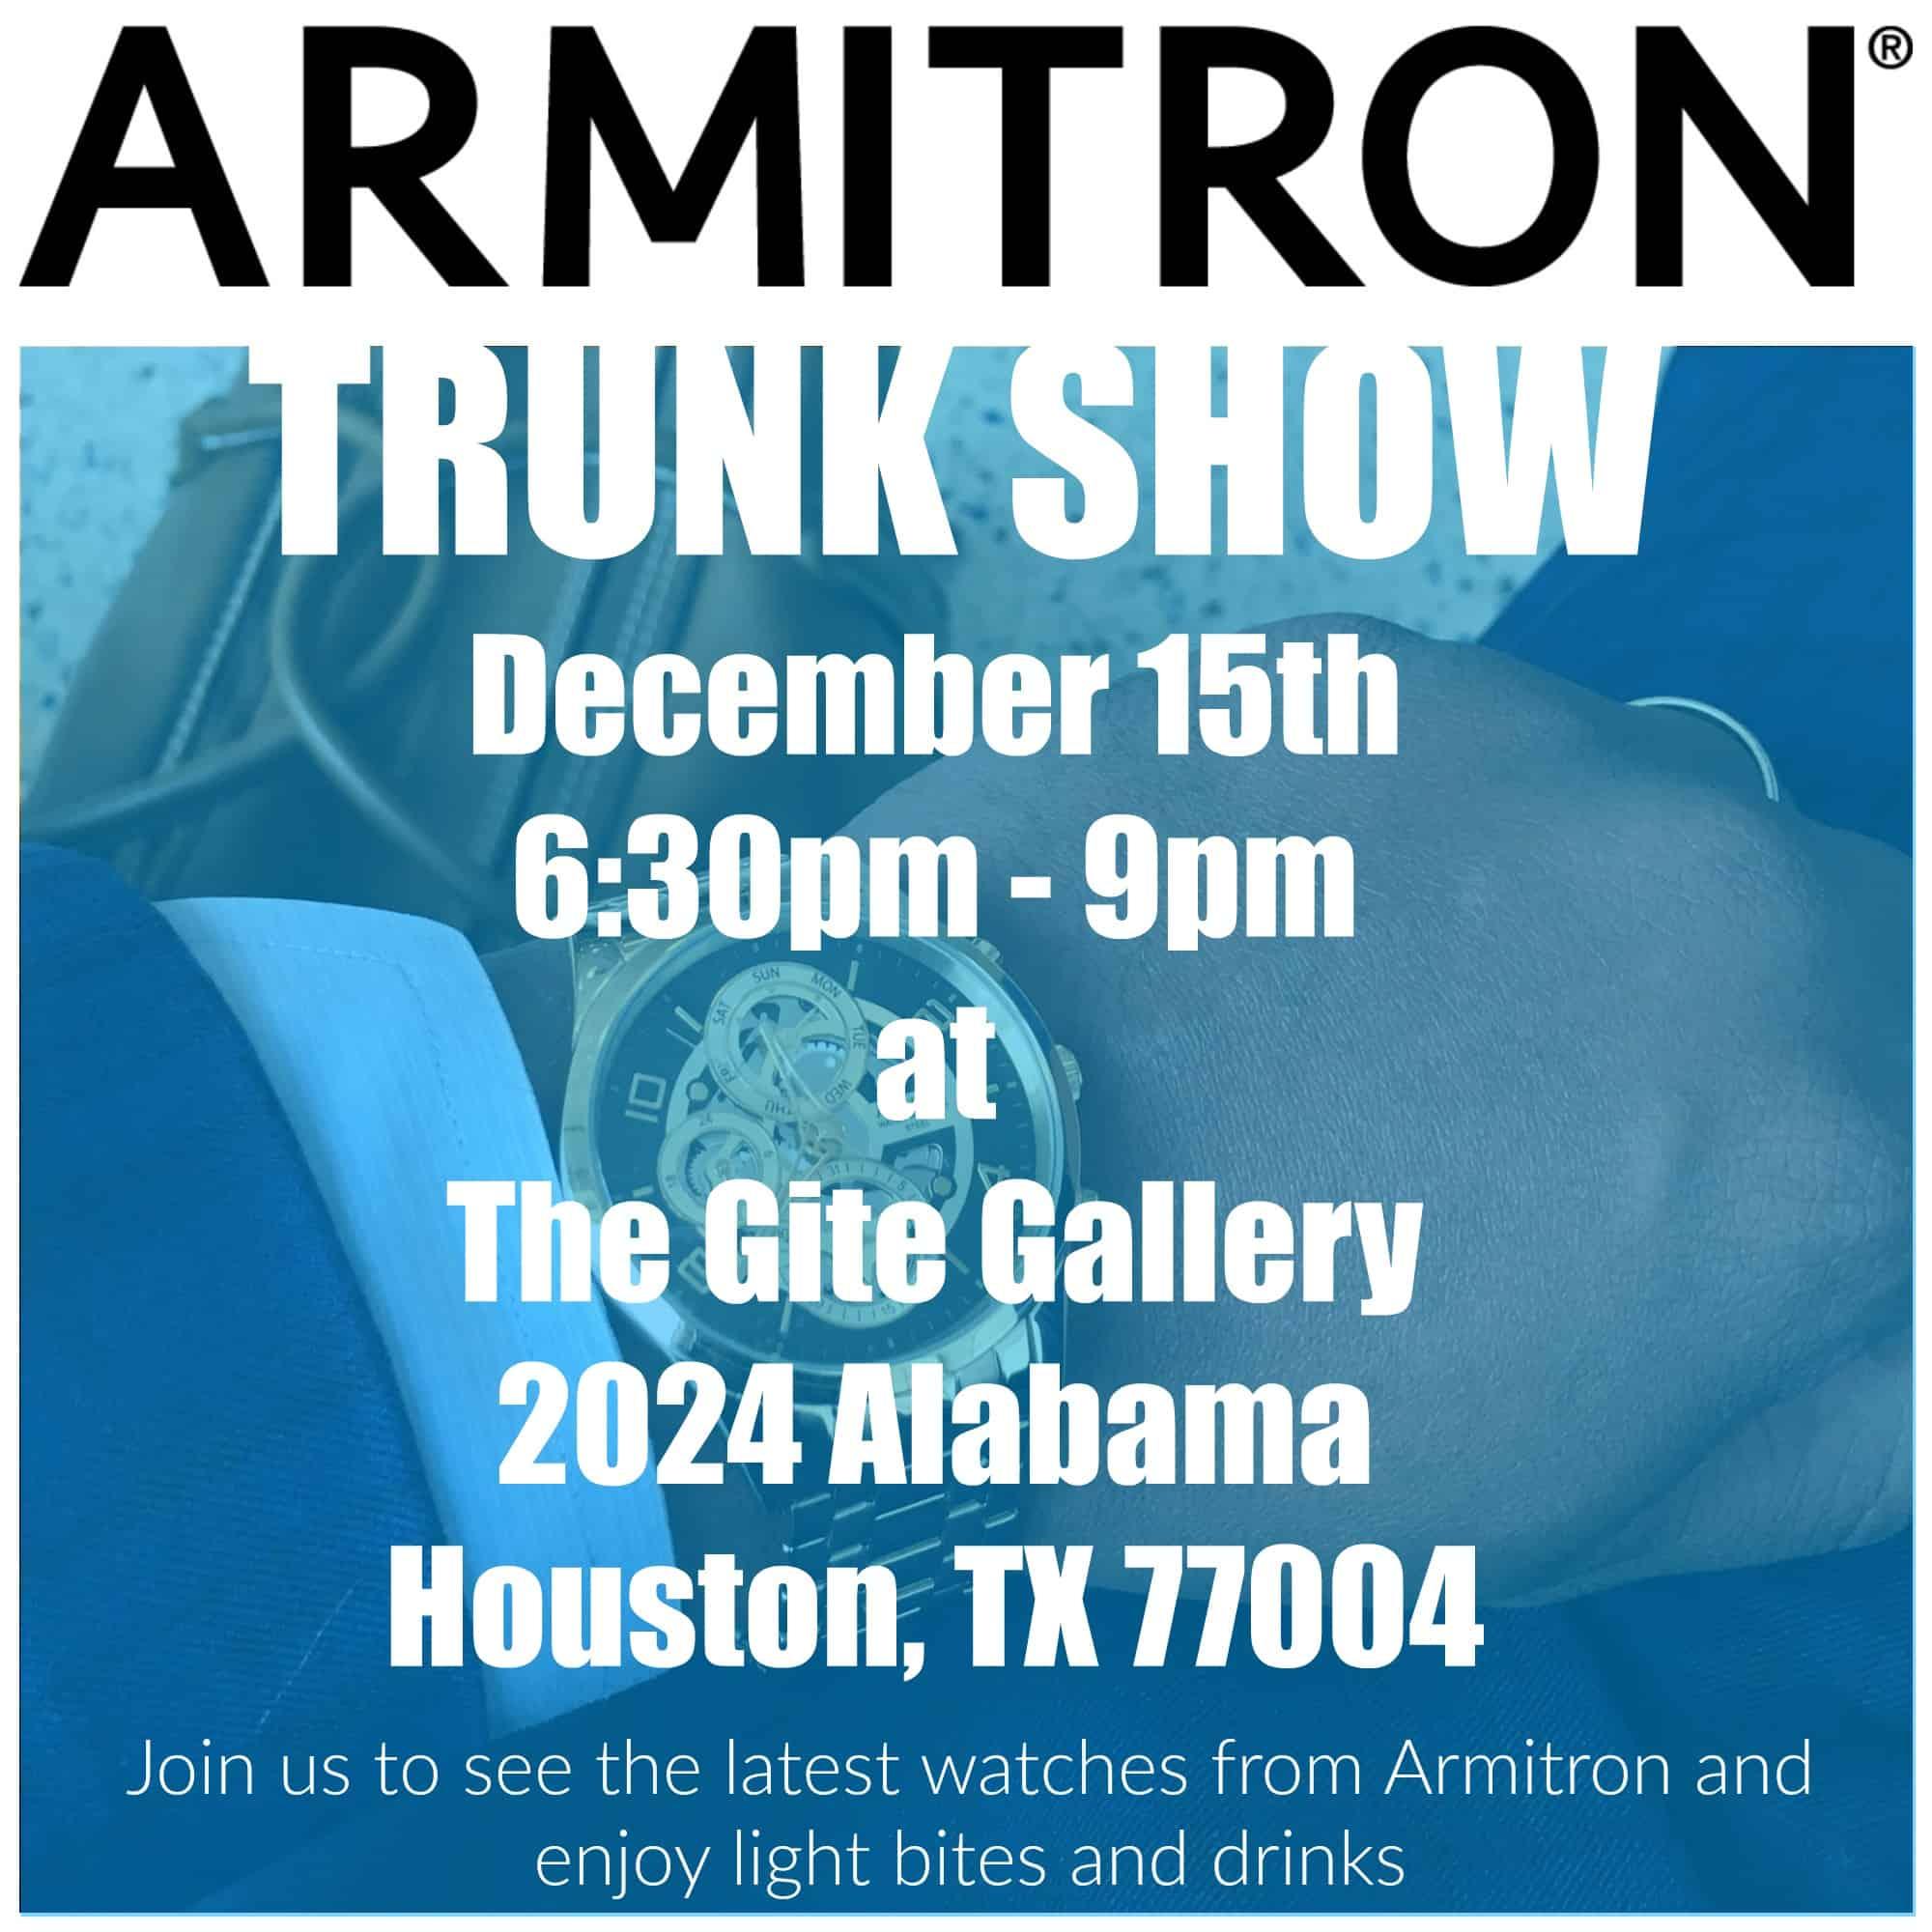 armitron-trunk-show2